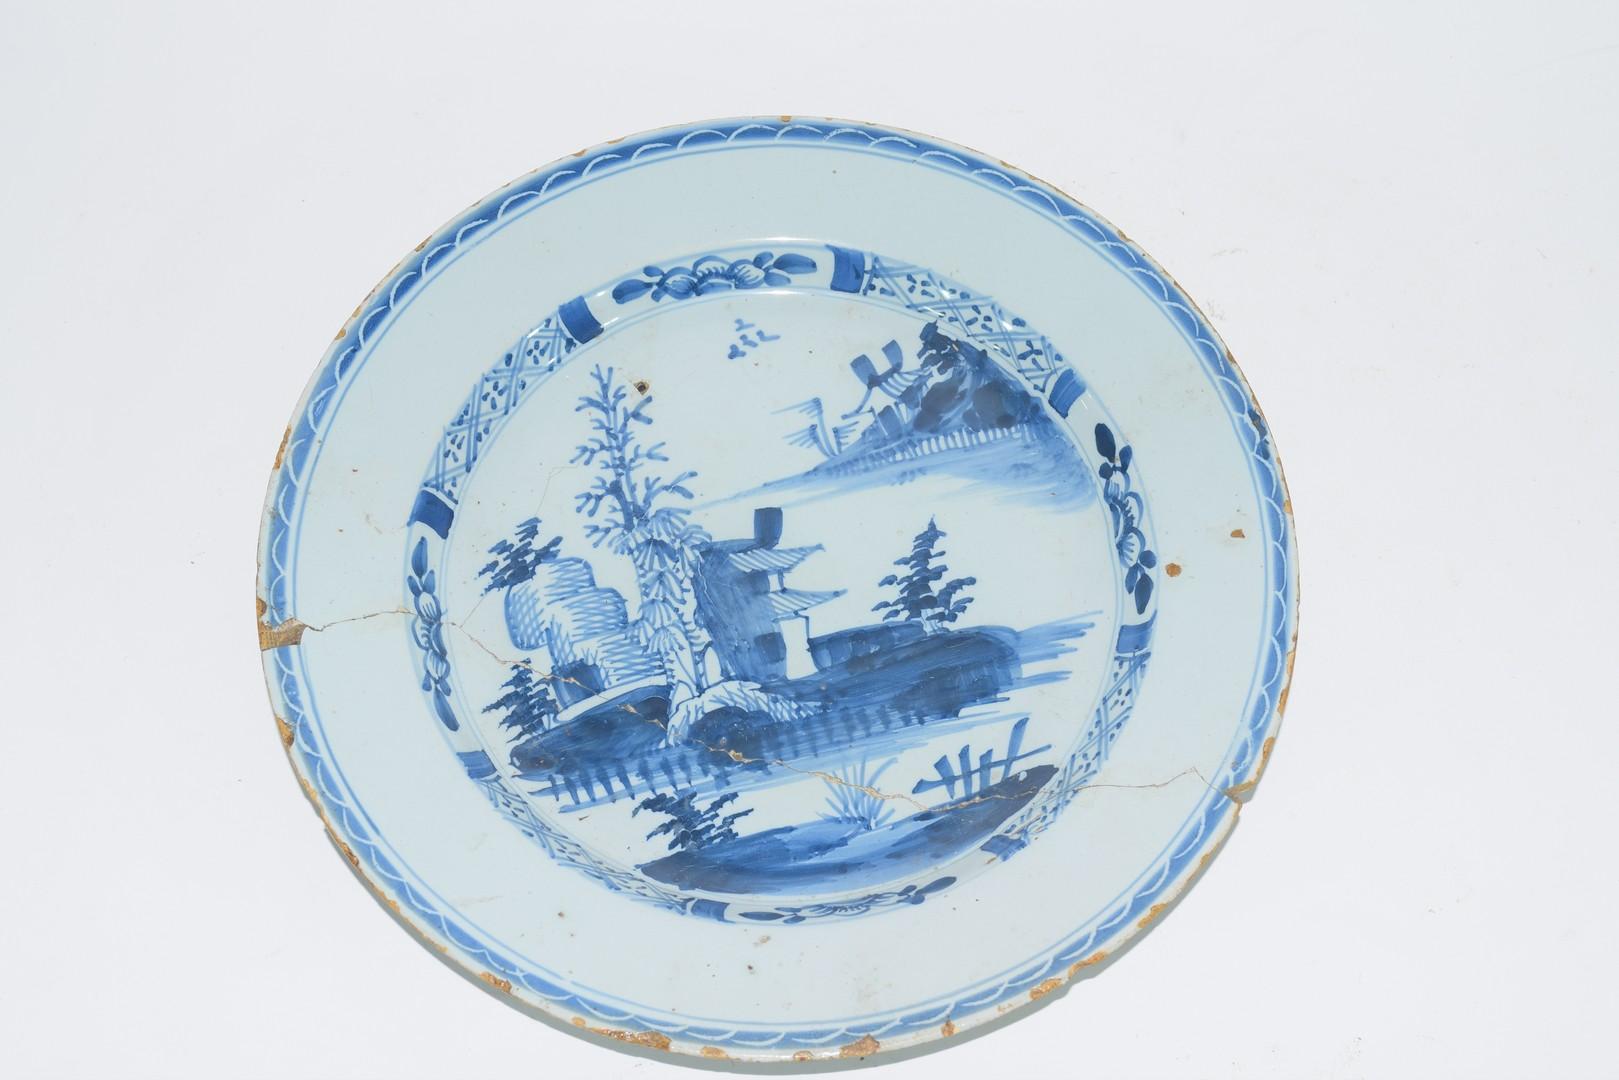 Three 18th century English Delft plates - Image 6 of 7